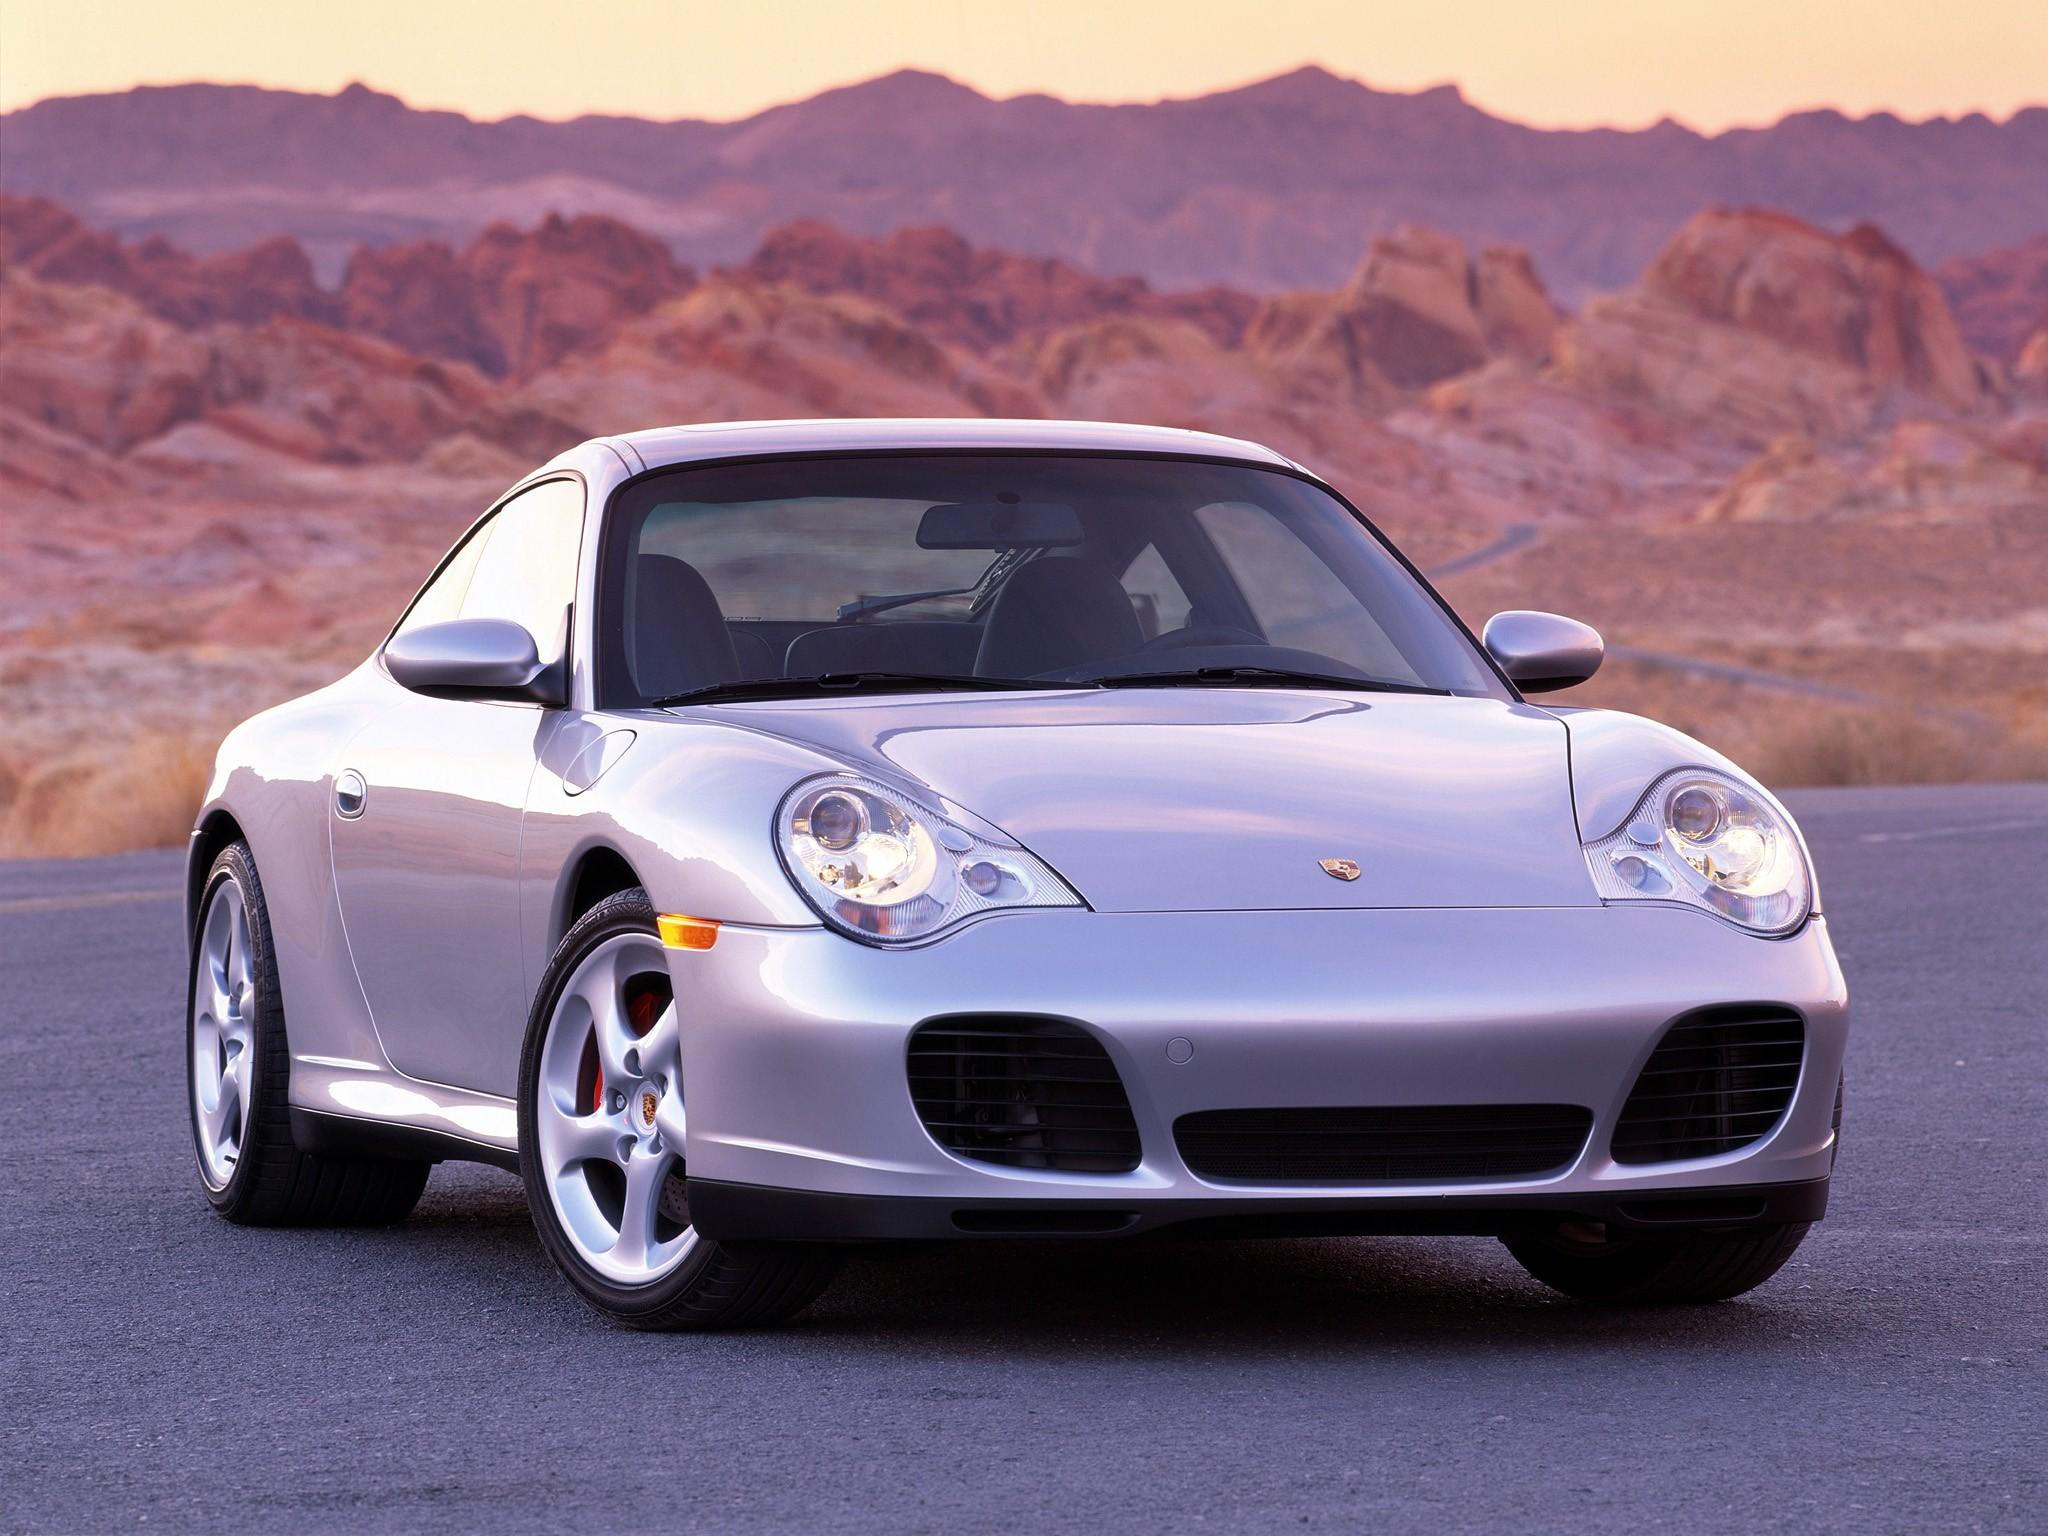 Porsche Carrera S on porsche panamera, porsche 911 boxster s, porsche 911 car, porsche cayenne, porsche 911 gt2, porsche 911 c4s, porsche 911 50th anniversary edition,